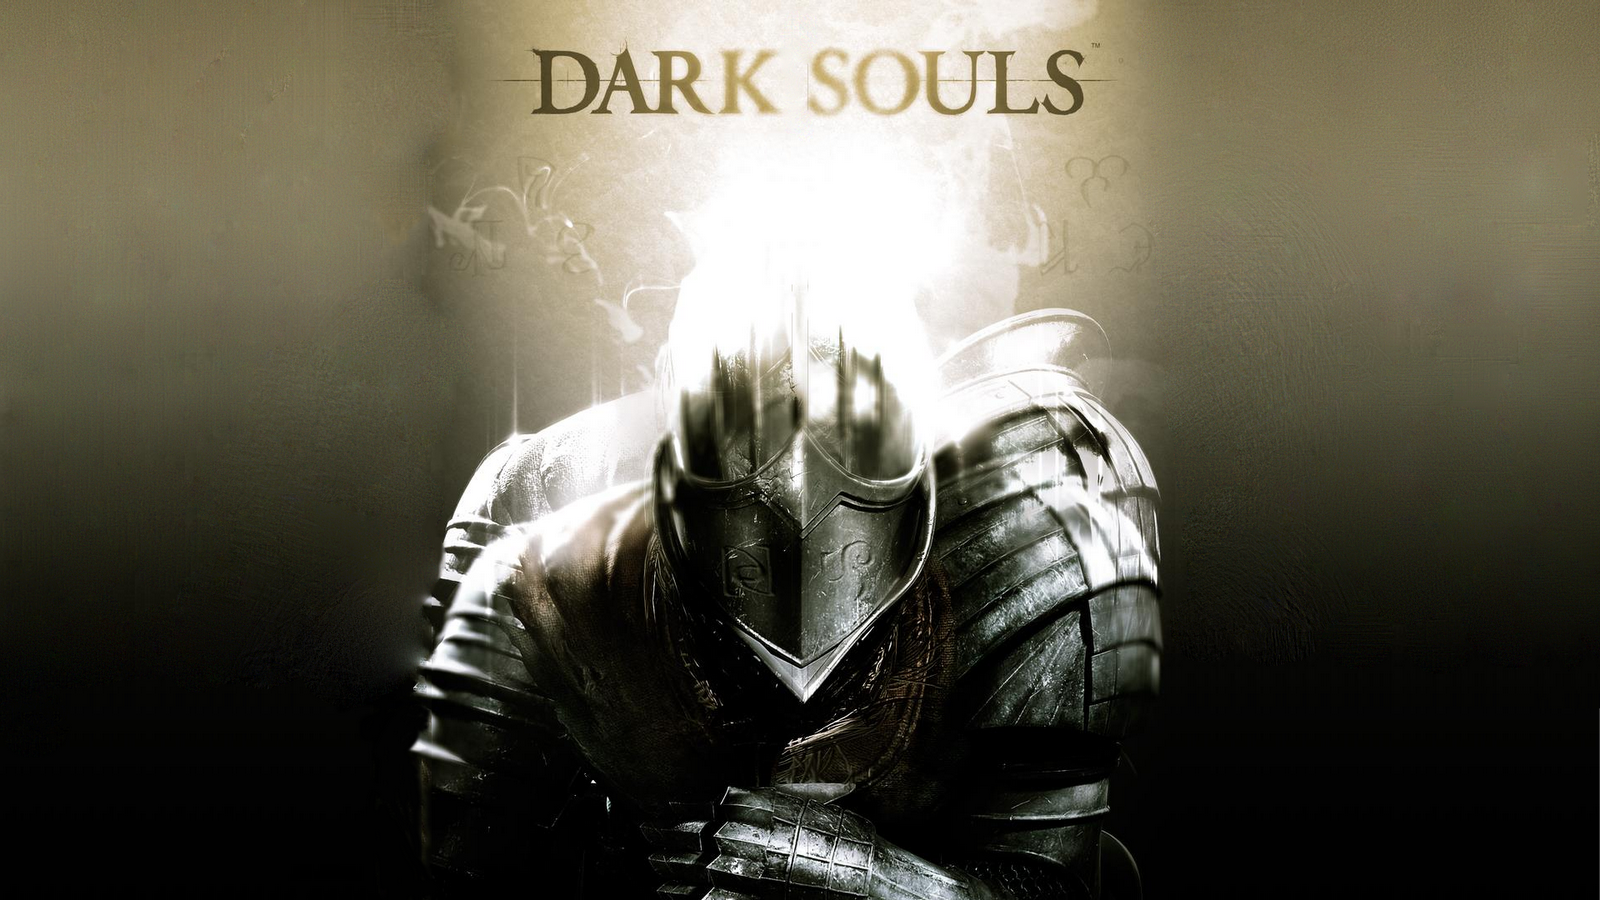 Free Download Wallpapers De Dark Souls En Hd Dark Souls Es